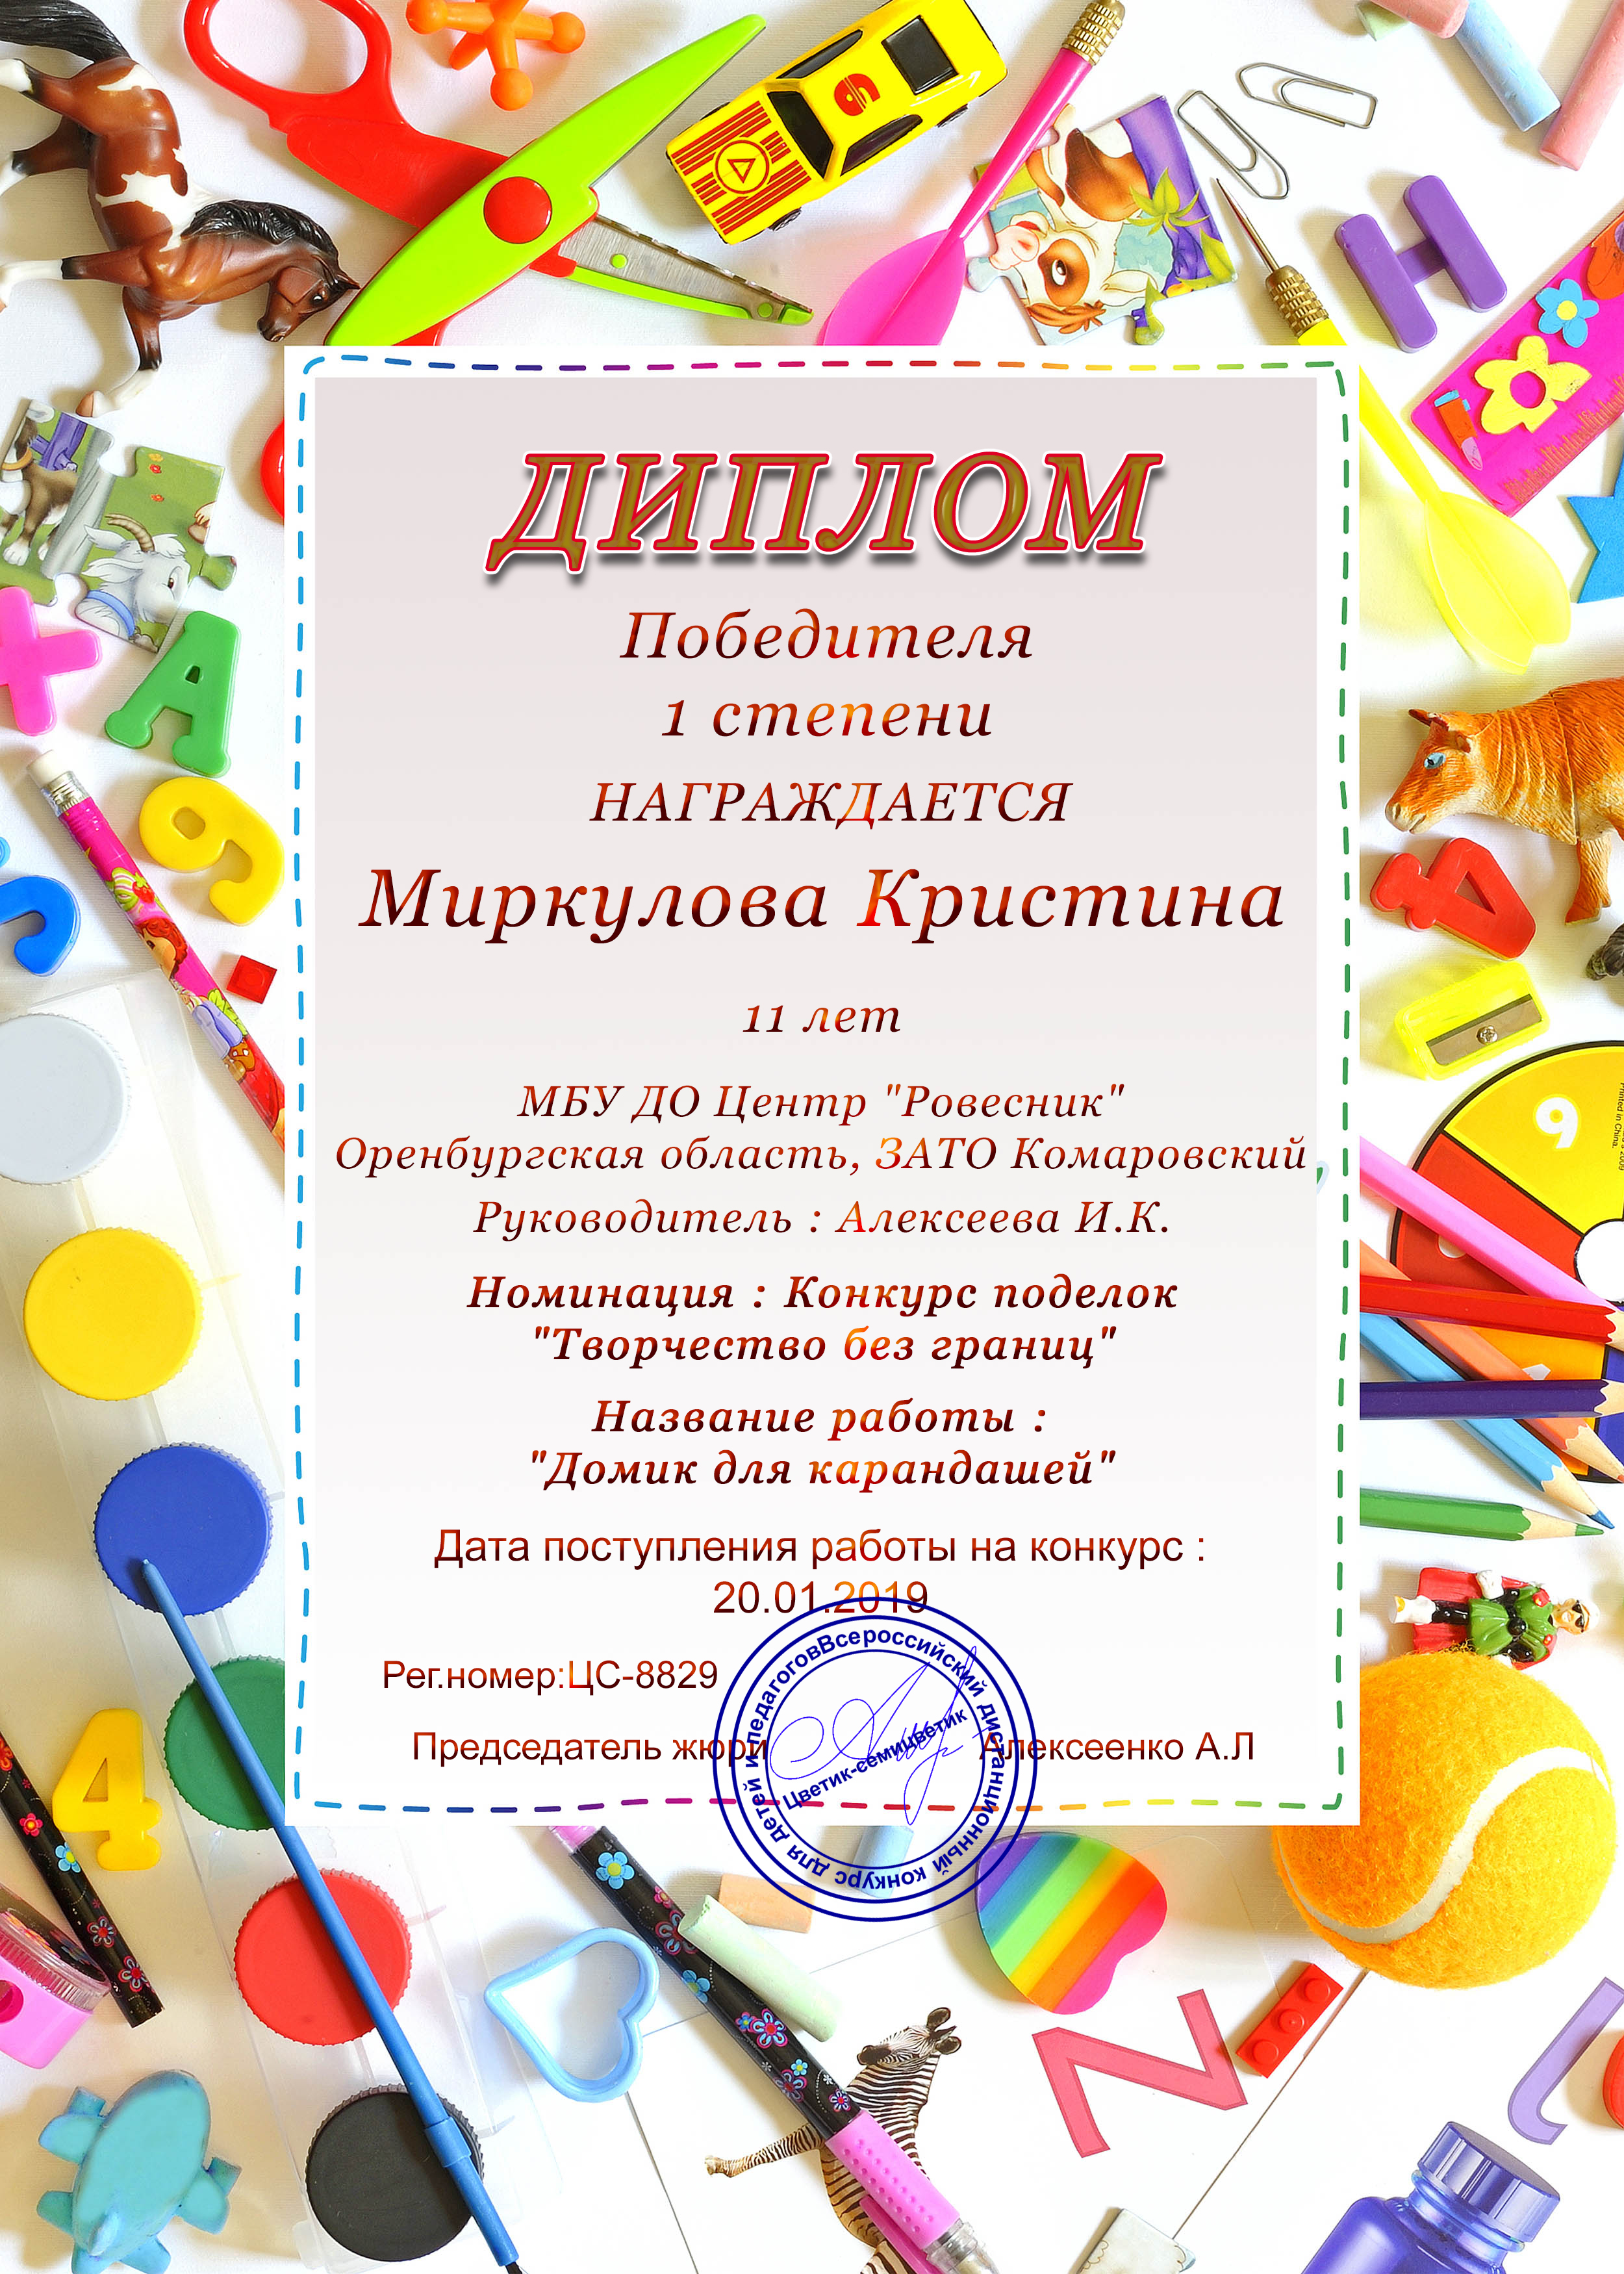 Миркулова Кристина